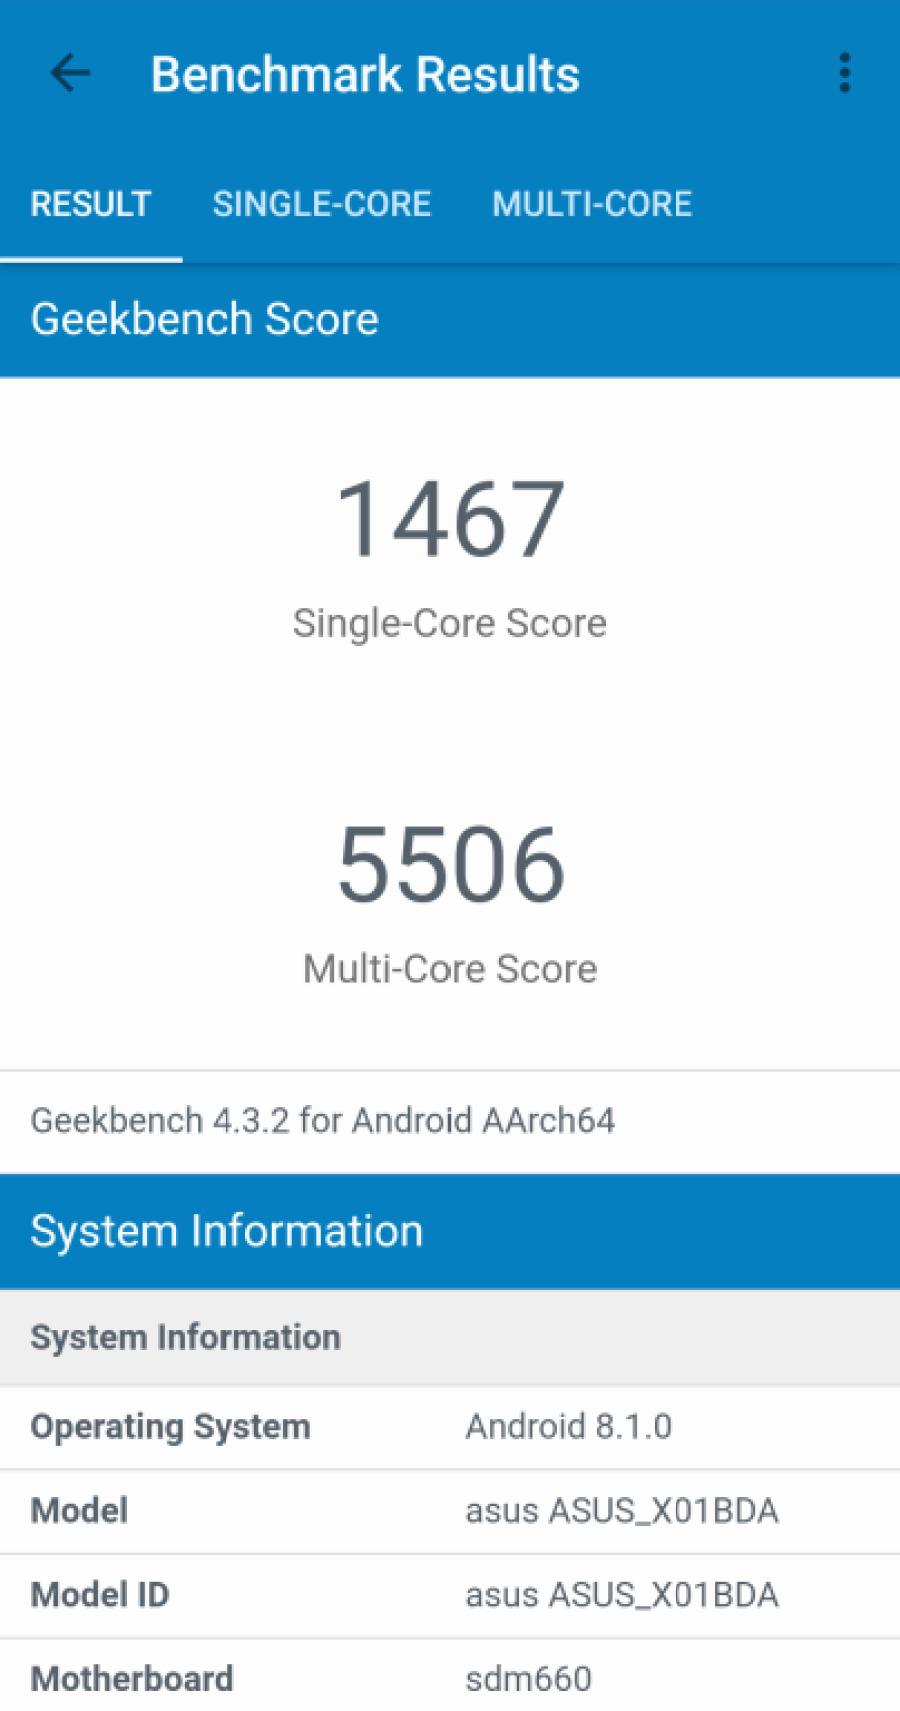 Zenfone Max Pro M2 Geekbench Benchmark